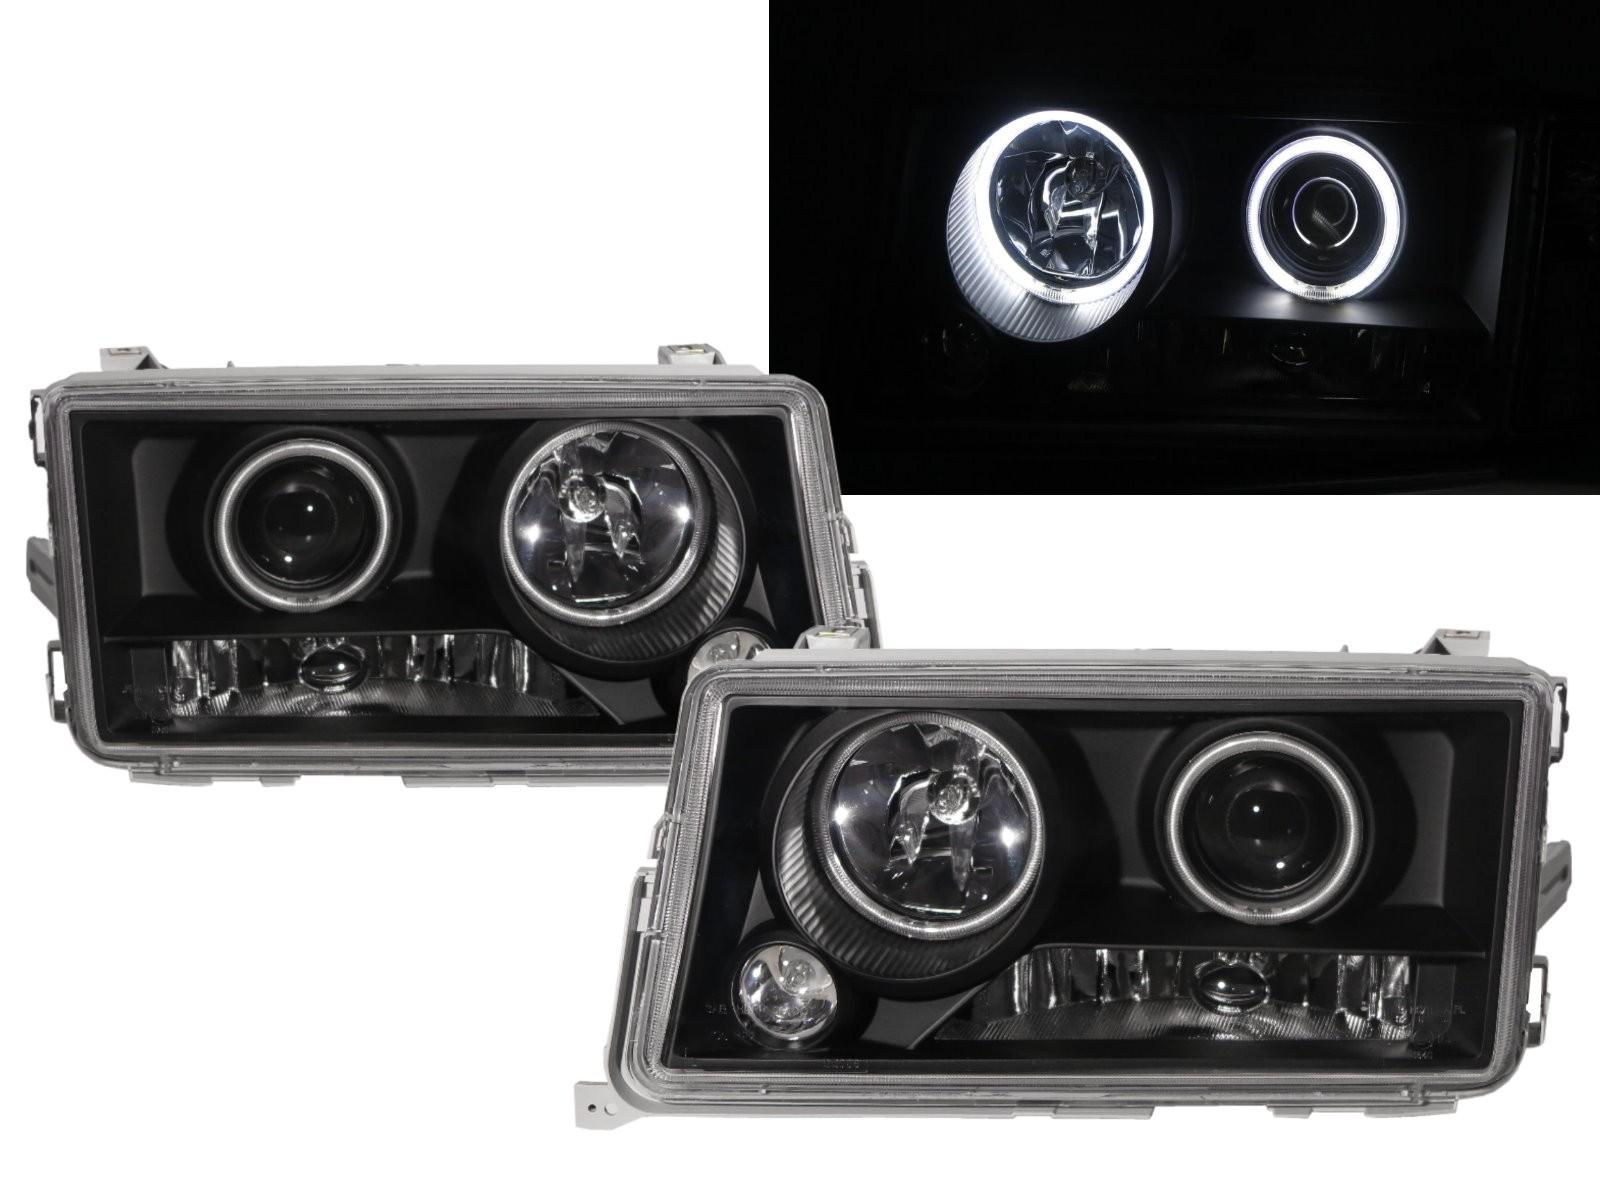 CrazyTheGod C-CLASS W201 190D 190E 1982-1993 Sedan 4D CCFL Projector Headlight Headlamp Black for Mercedes-Benz LHD